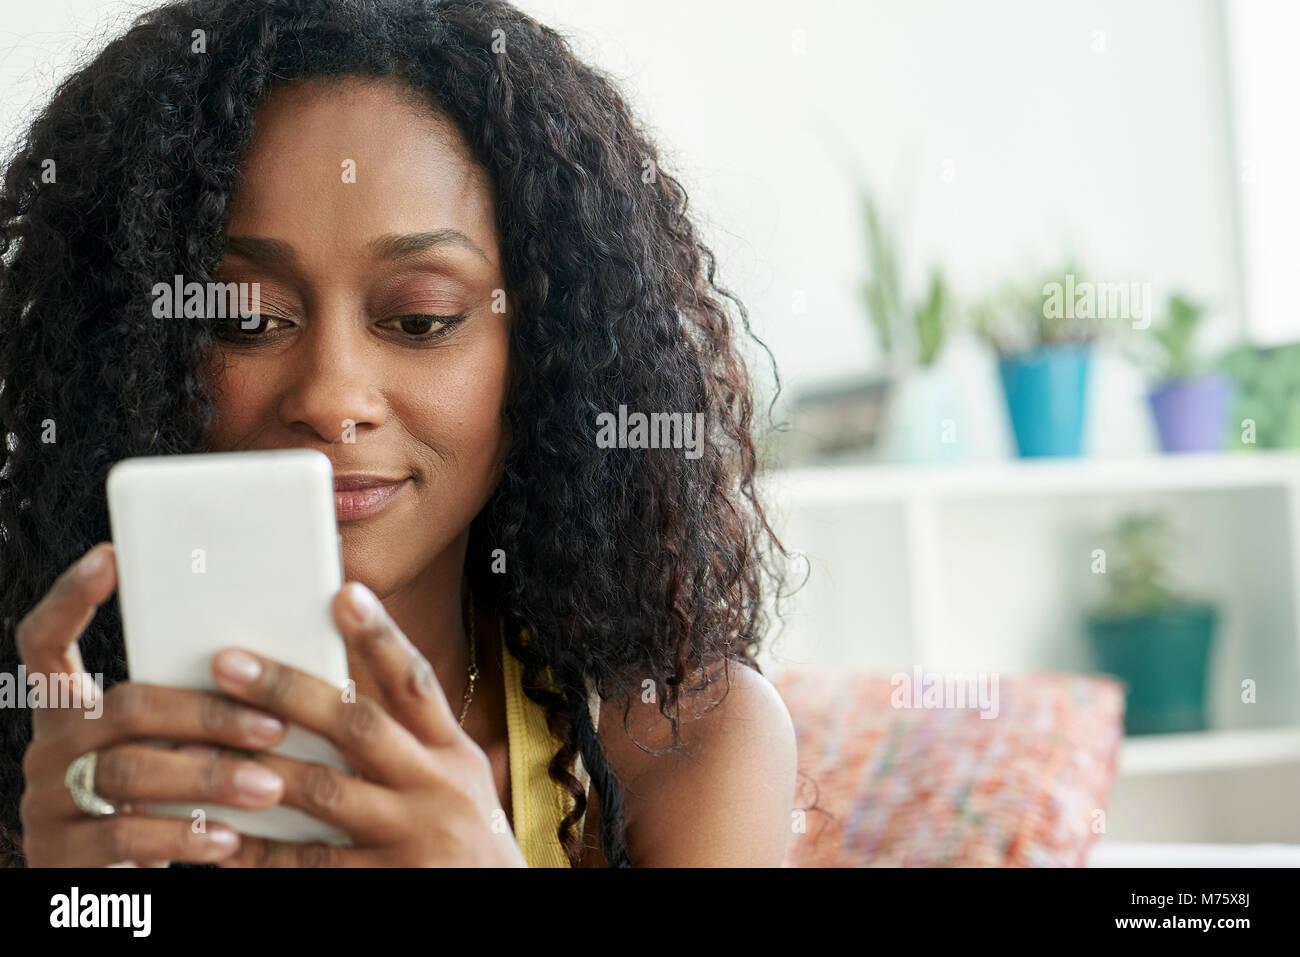 Woman using mobile phone - Stock Image